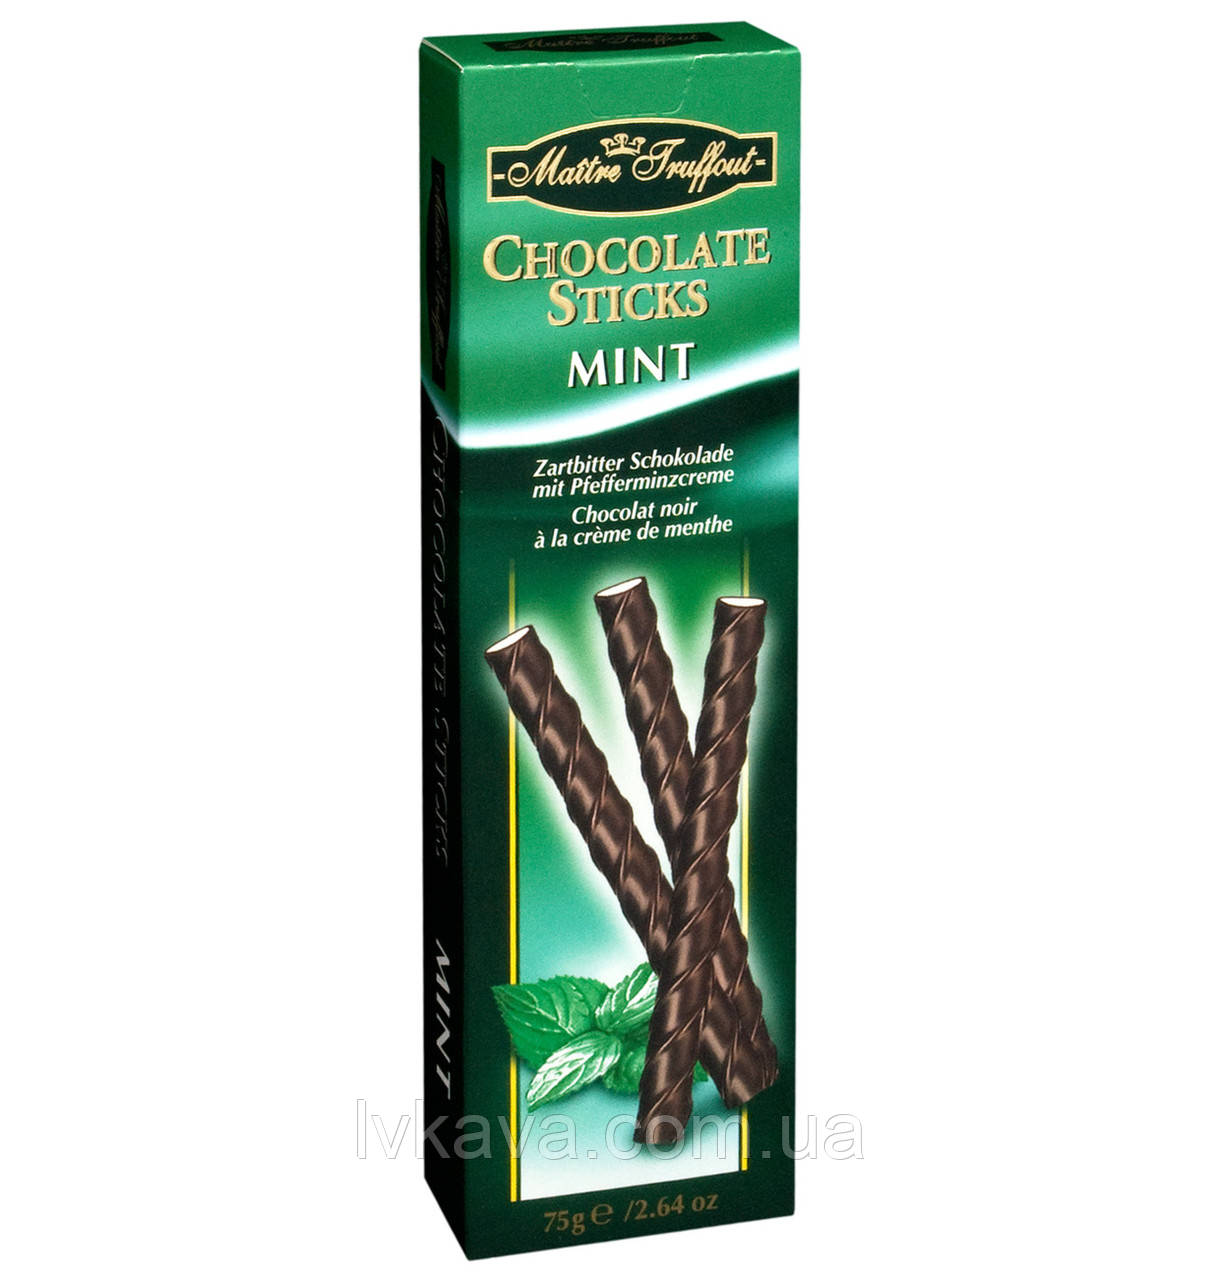 Черный шоколад Chocolate Sticks Mint Flavour  Maitre Truffout  , 75 гр